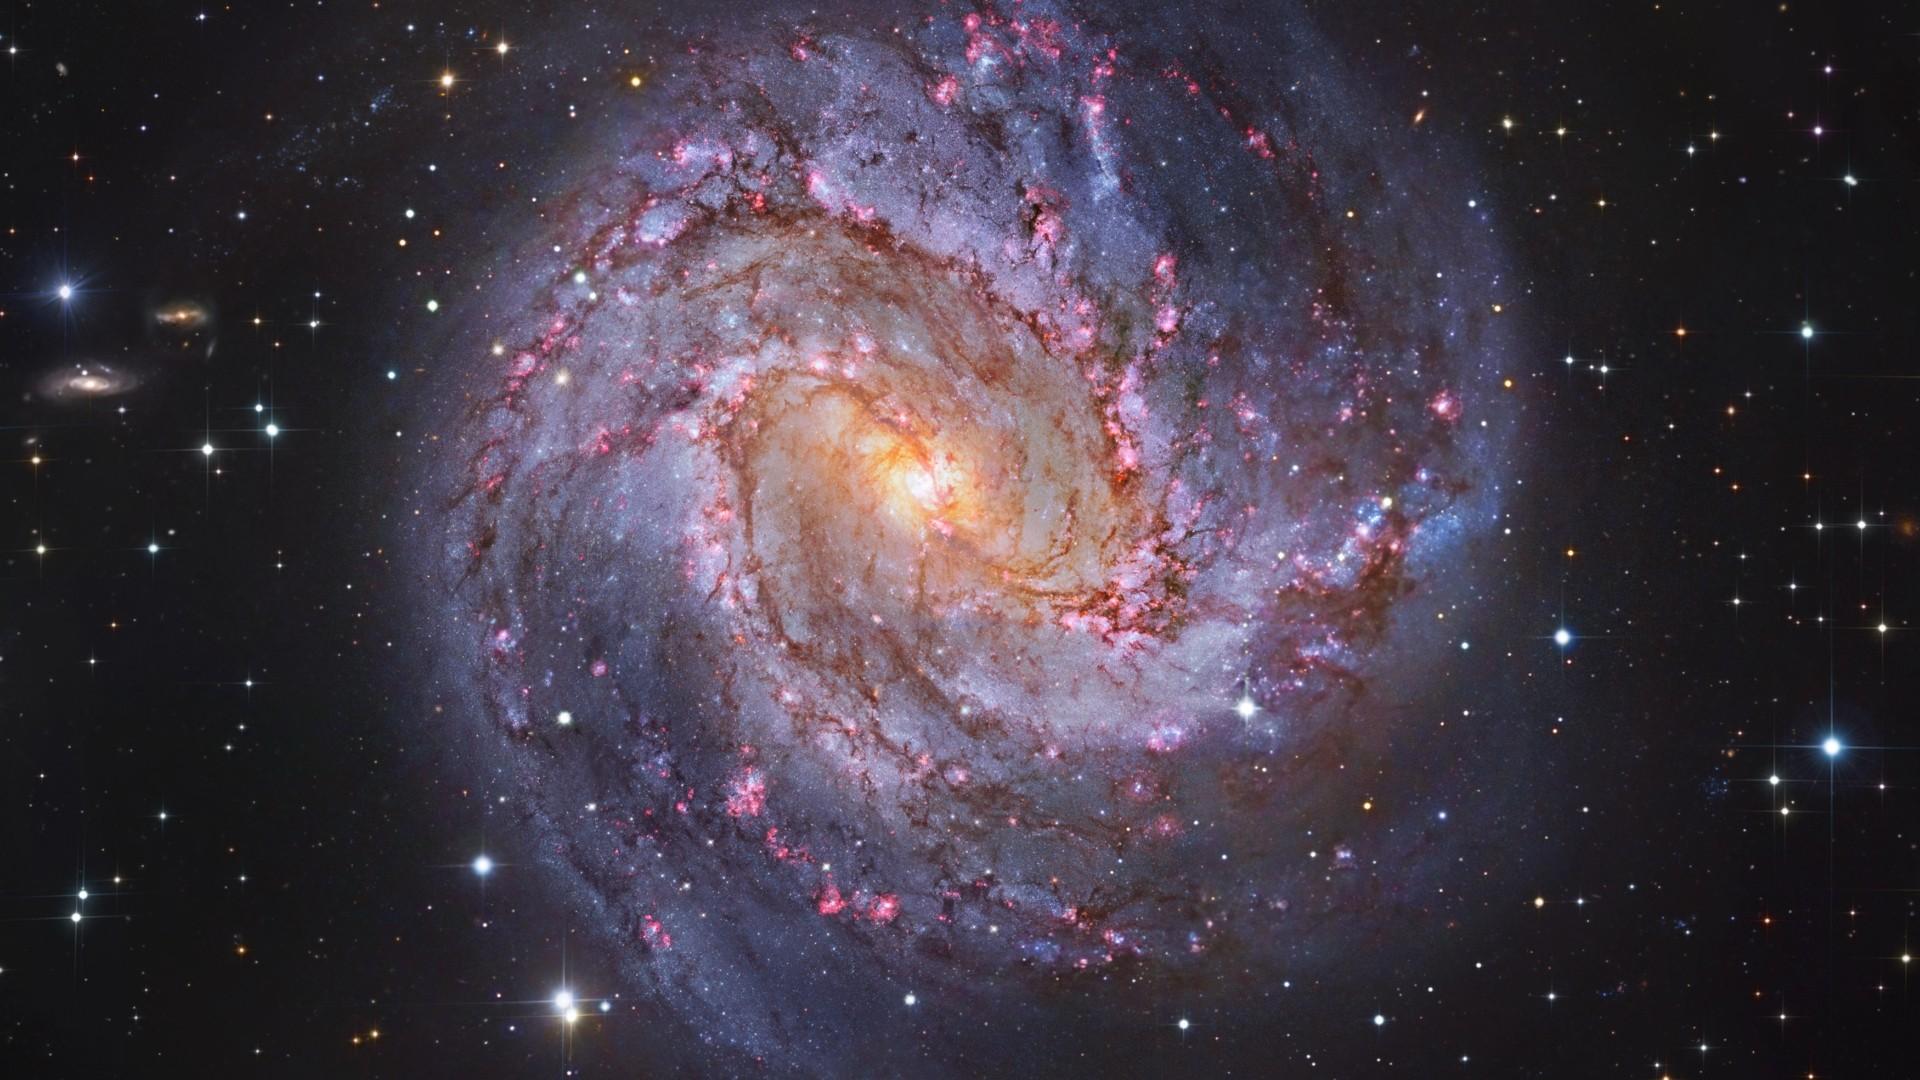 Wallpaper : galaxy, NASA, nebula, atmosphere, astronomy ...